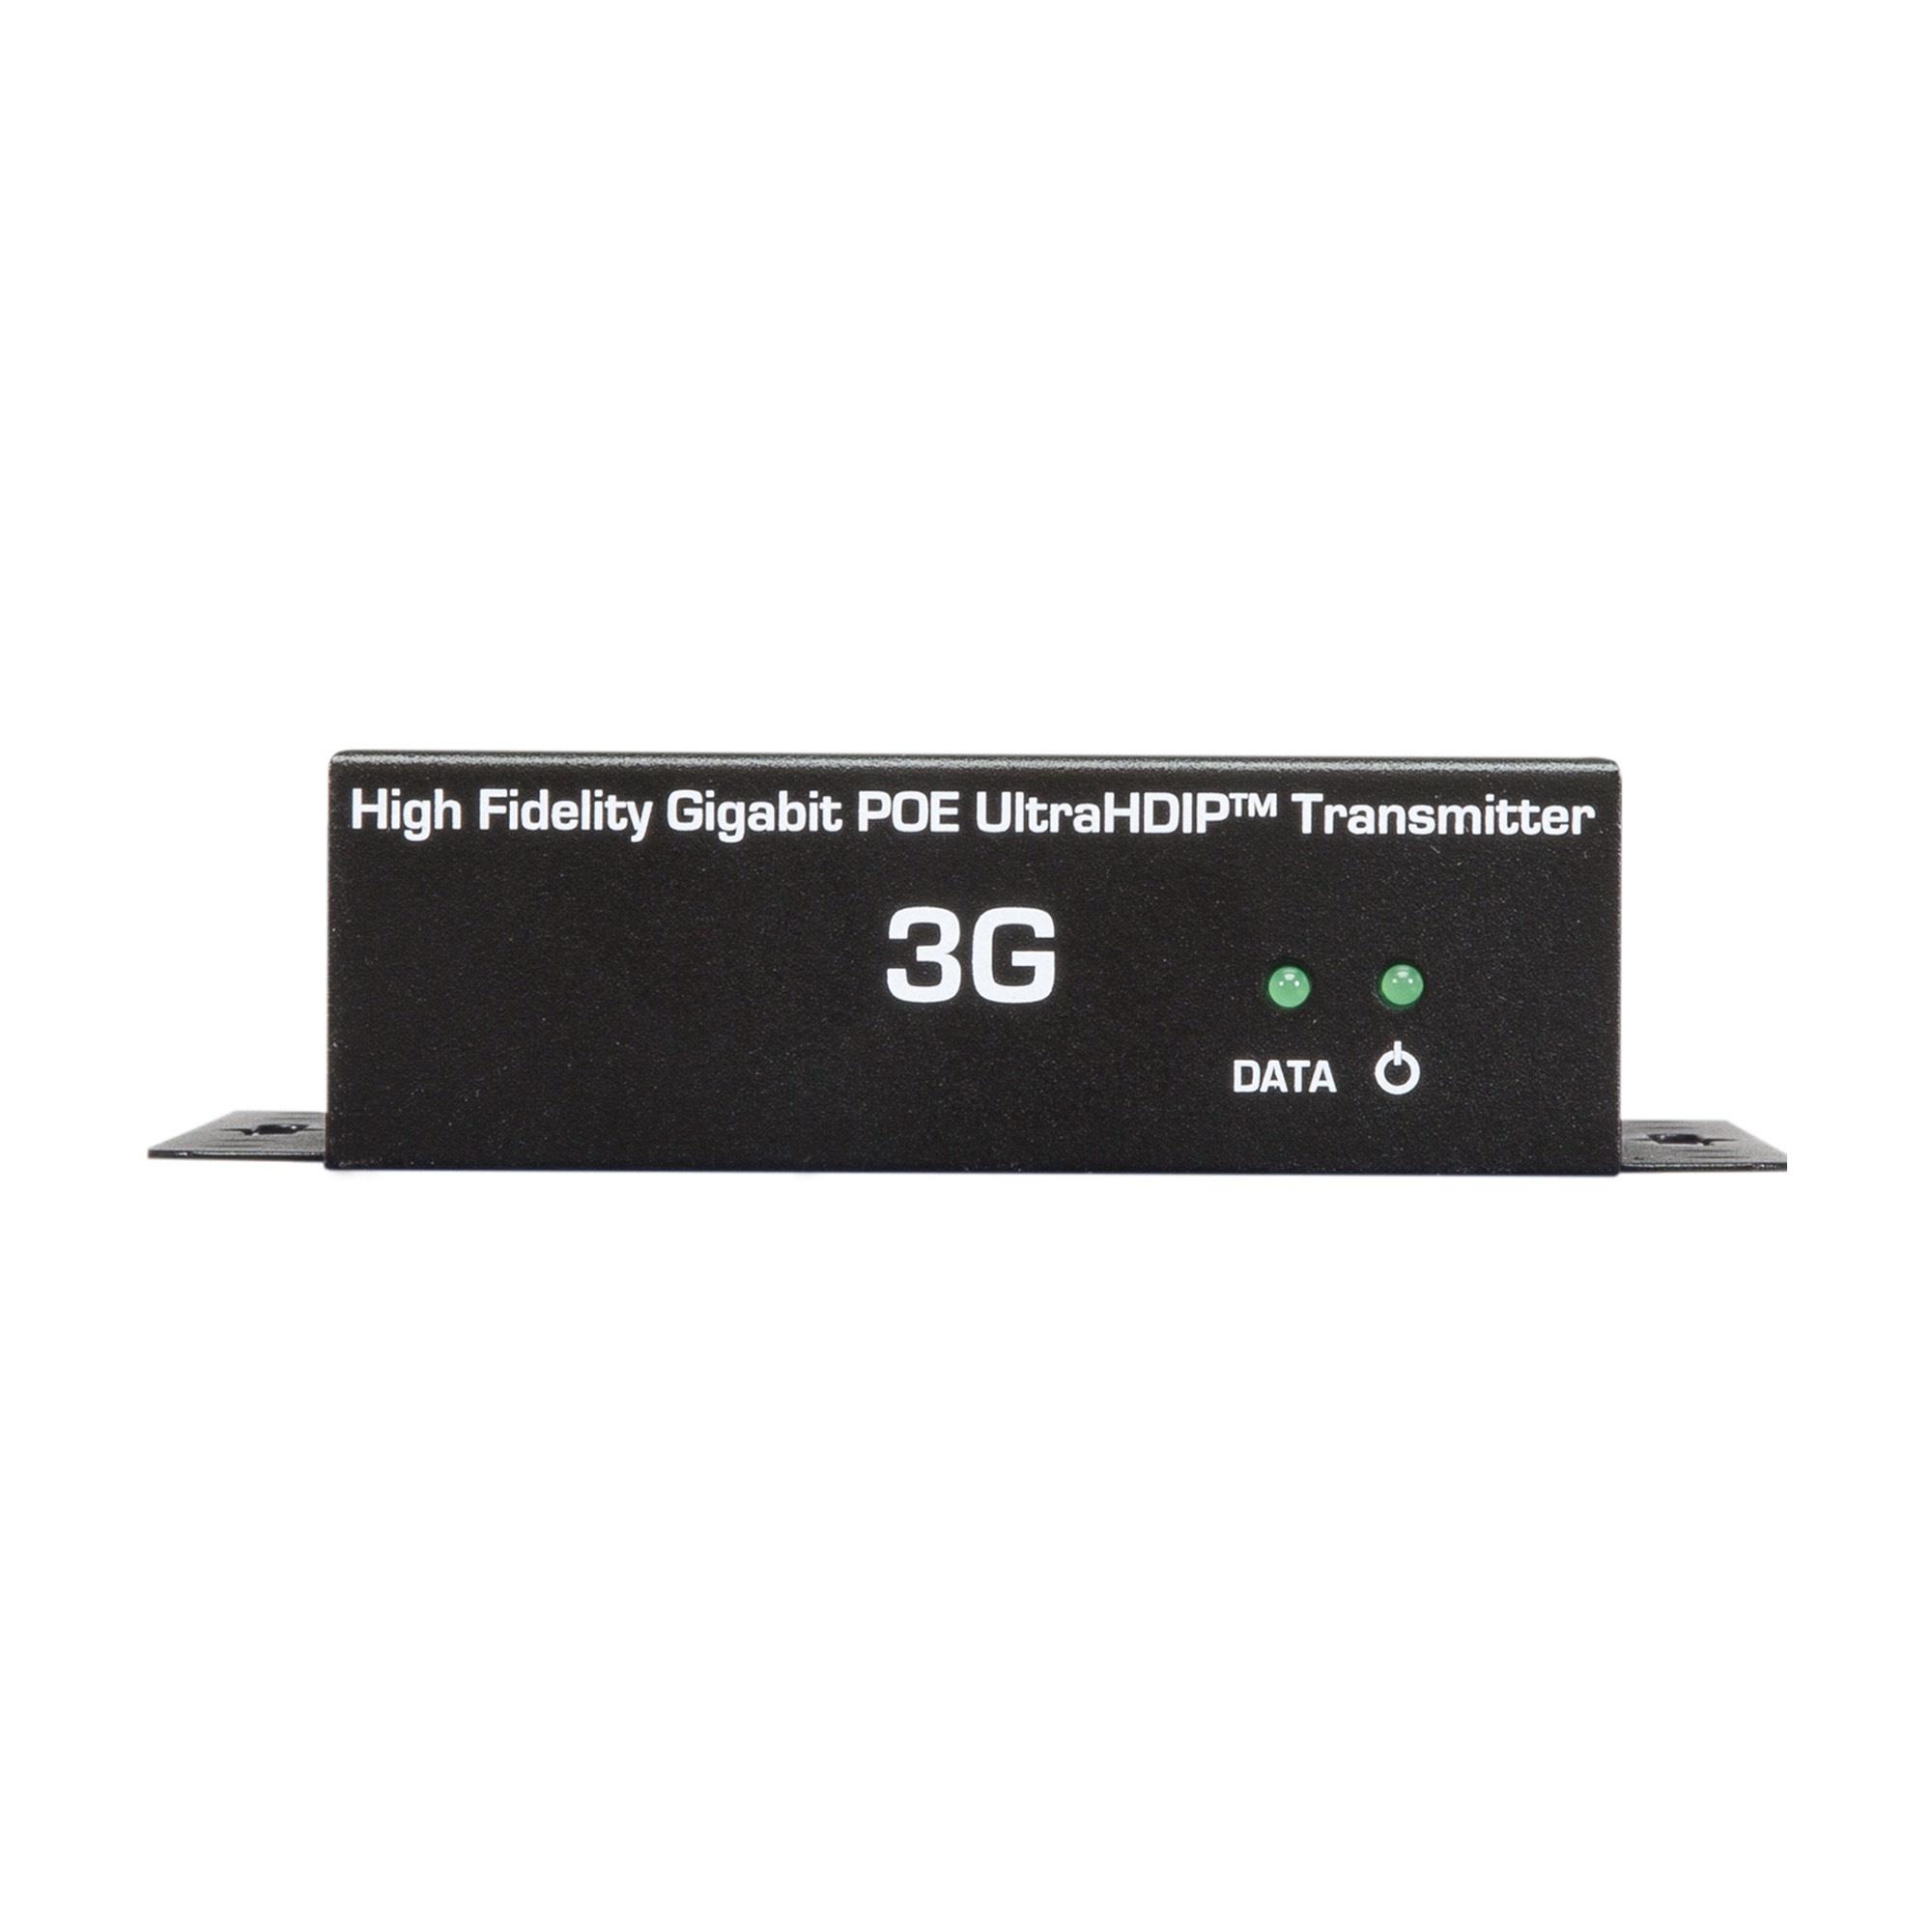 Just Add Power Ultra HD IP Gigabit POE Transmitter, 3G 707POE TX